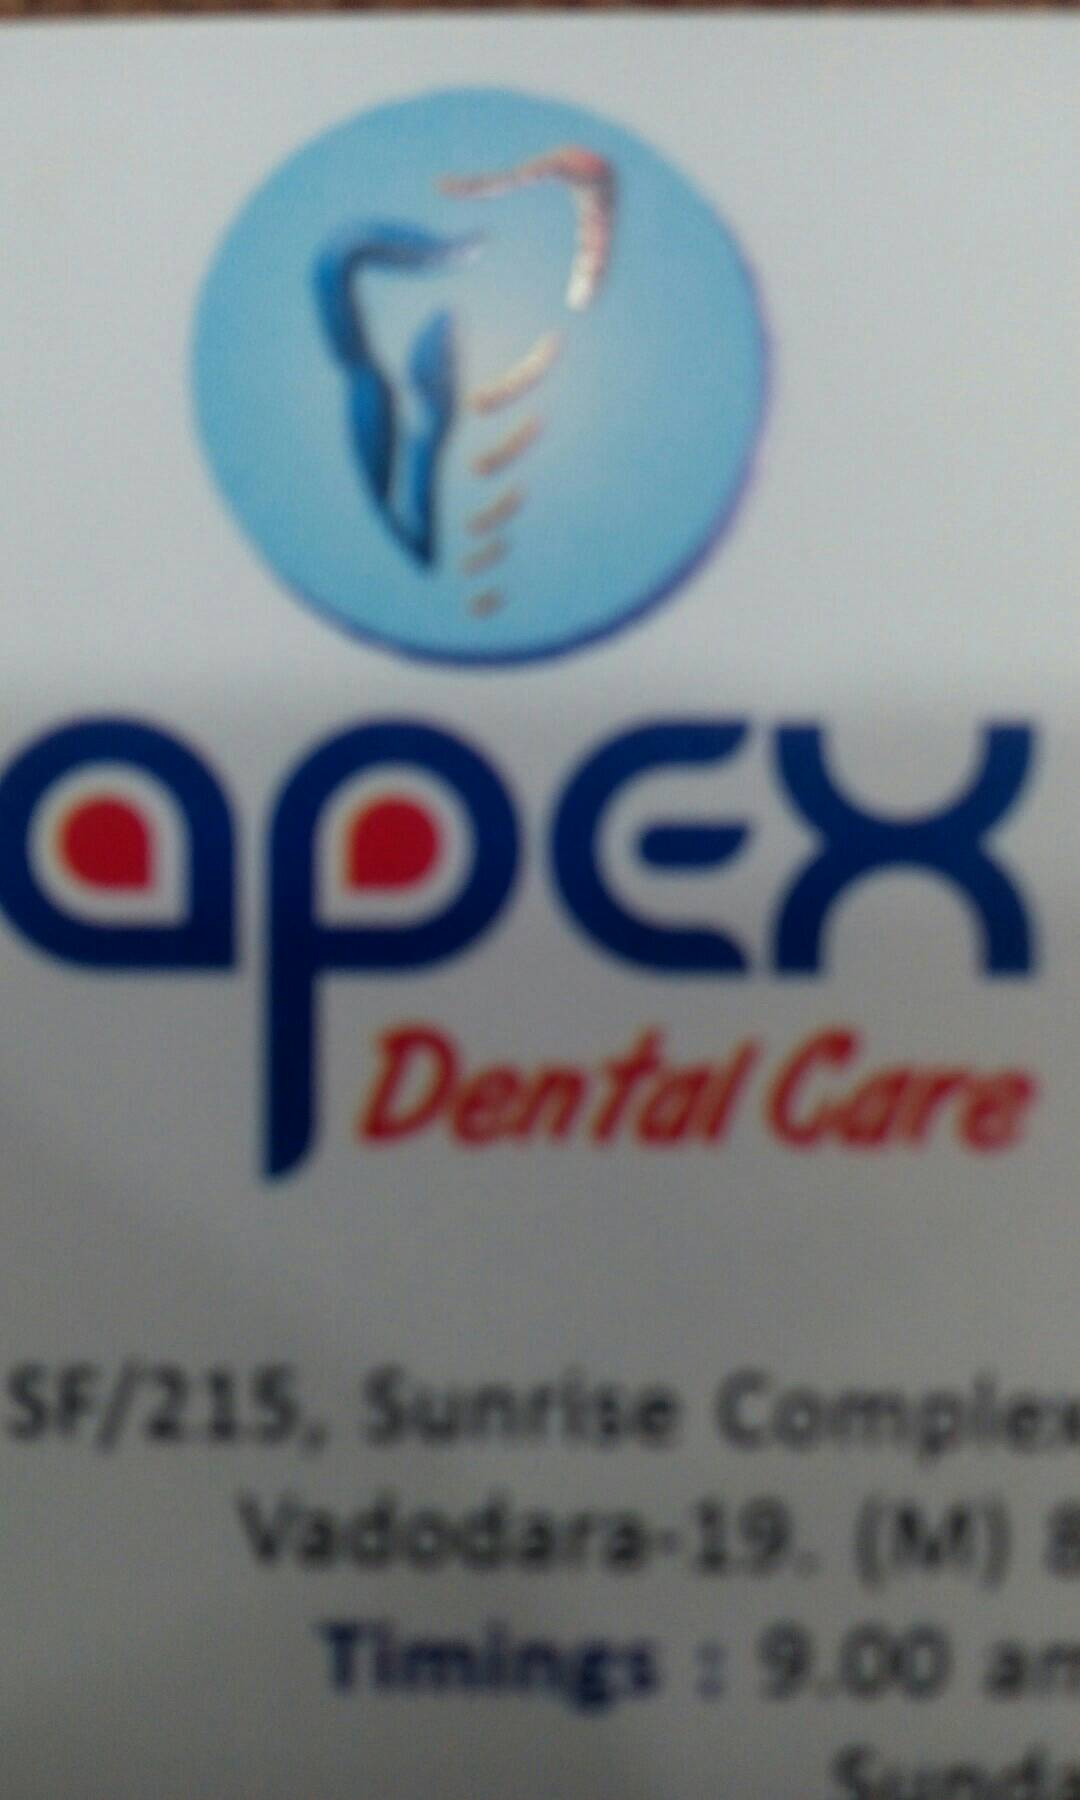 apexdentalcare - logo